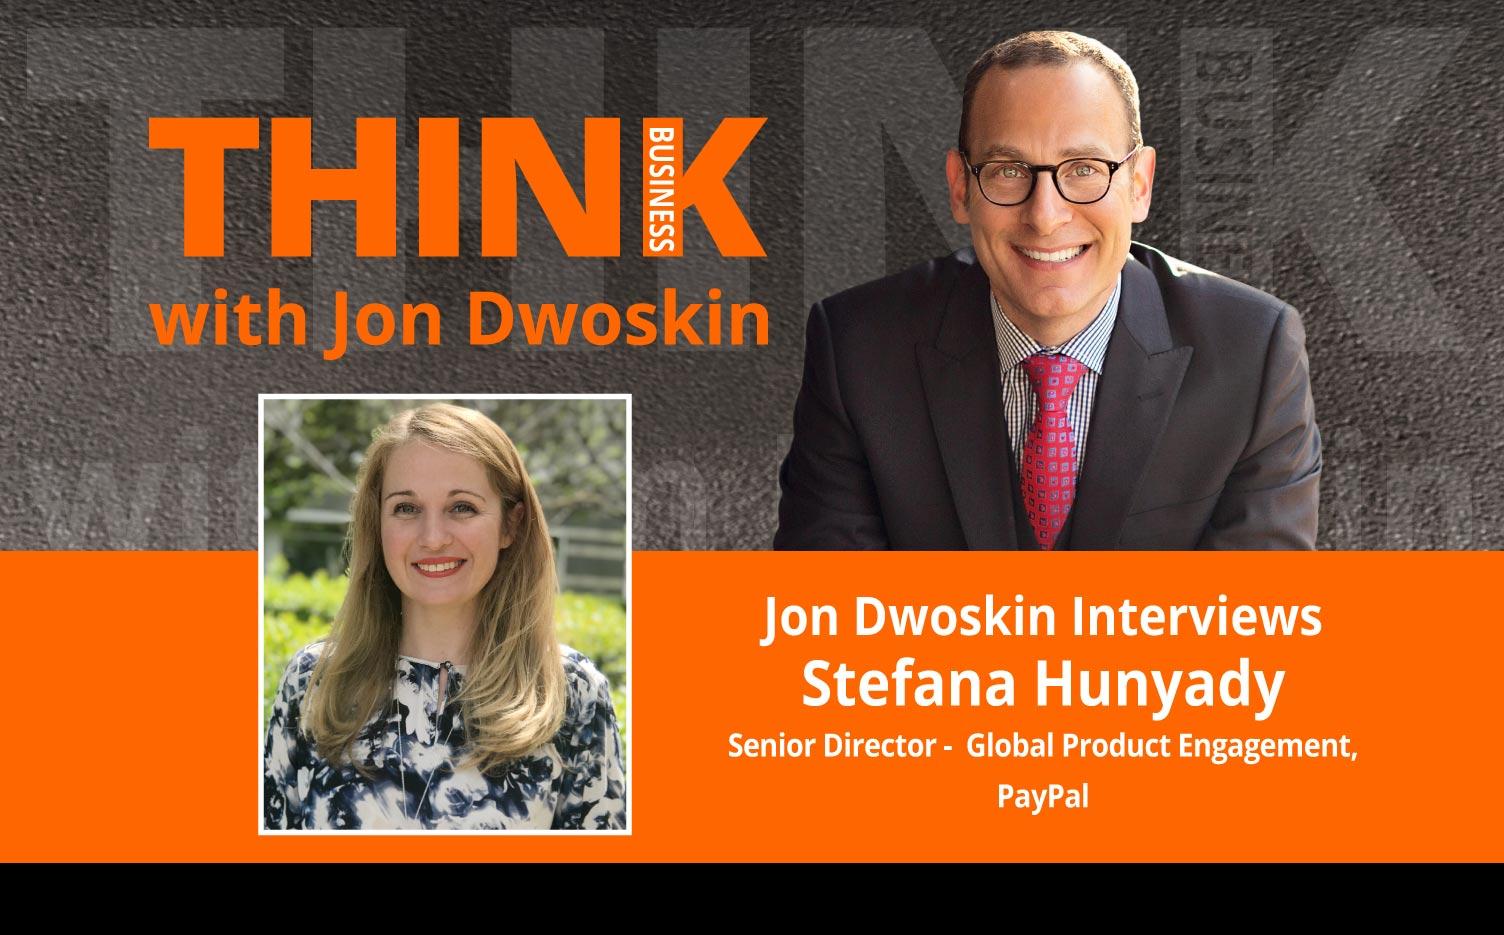 THINK Business: Jon Dwoskin Interviews Stefana Hunyady, Sr Director - Global Product Engagement, Paypal